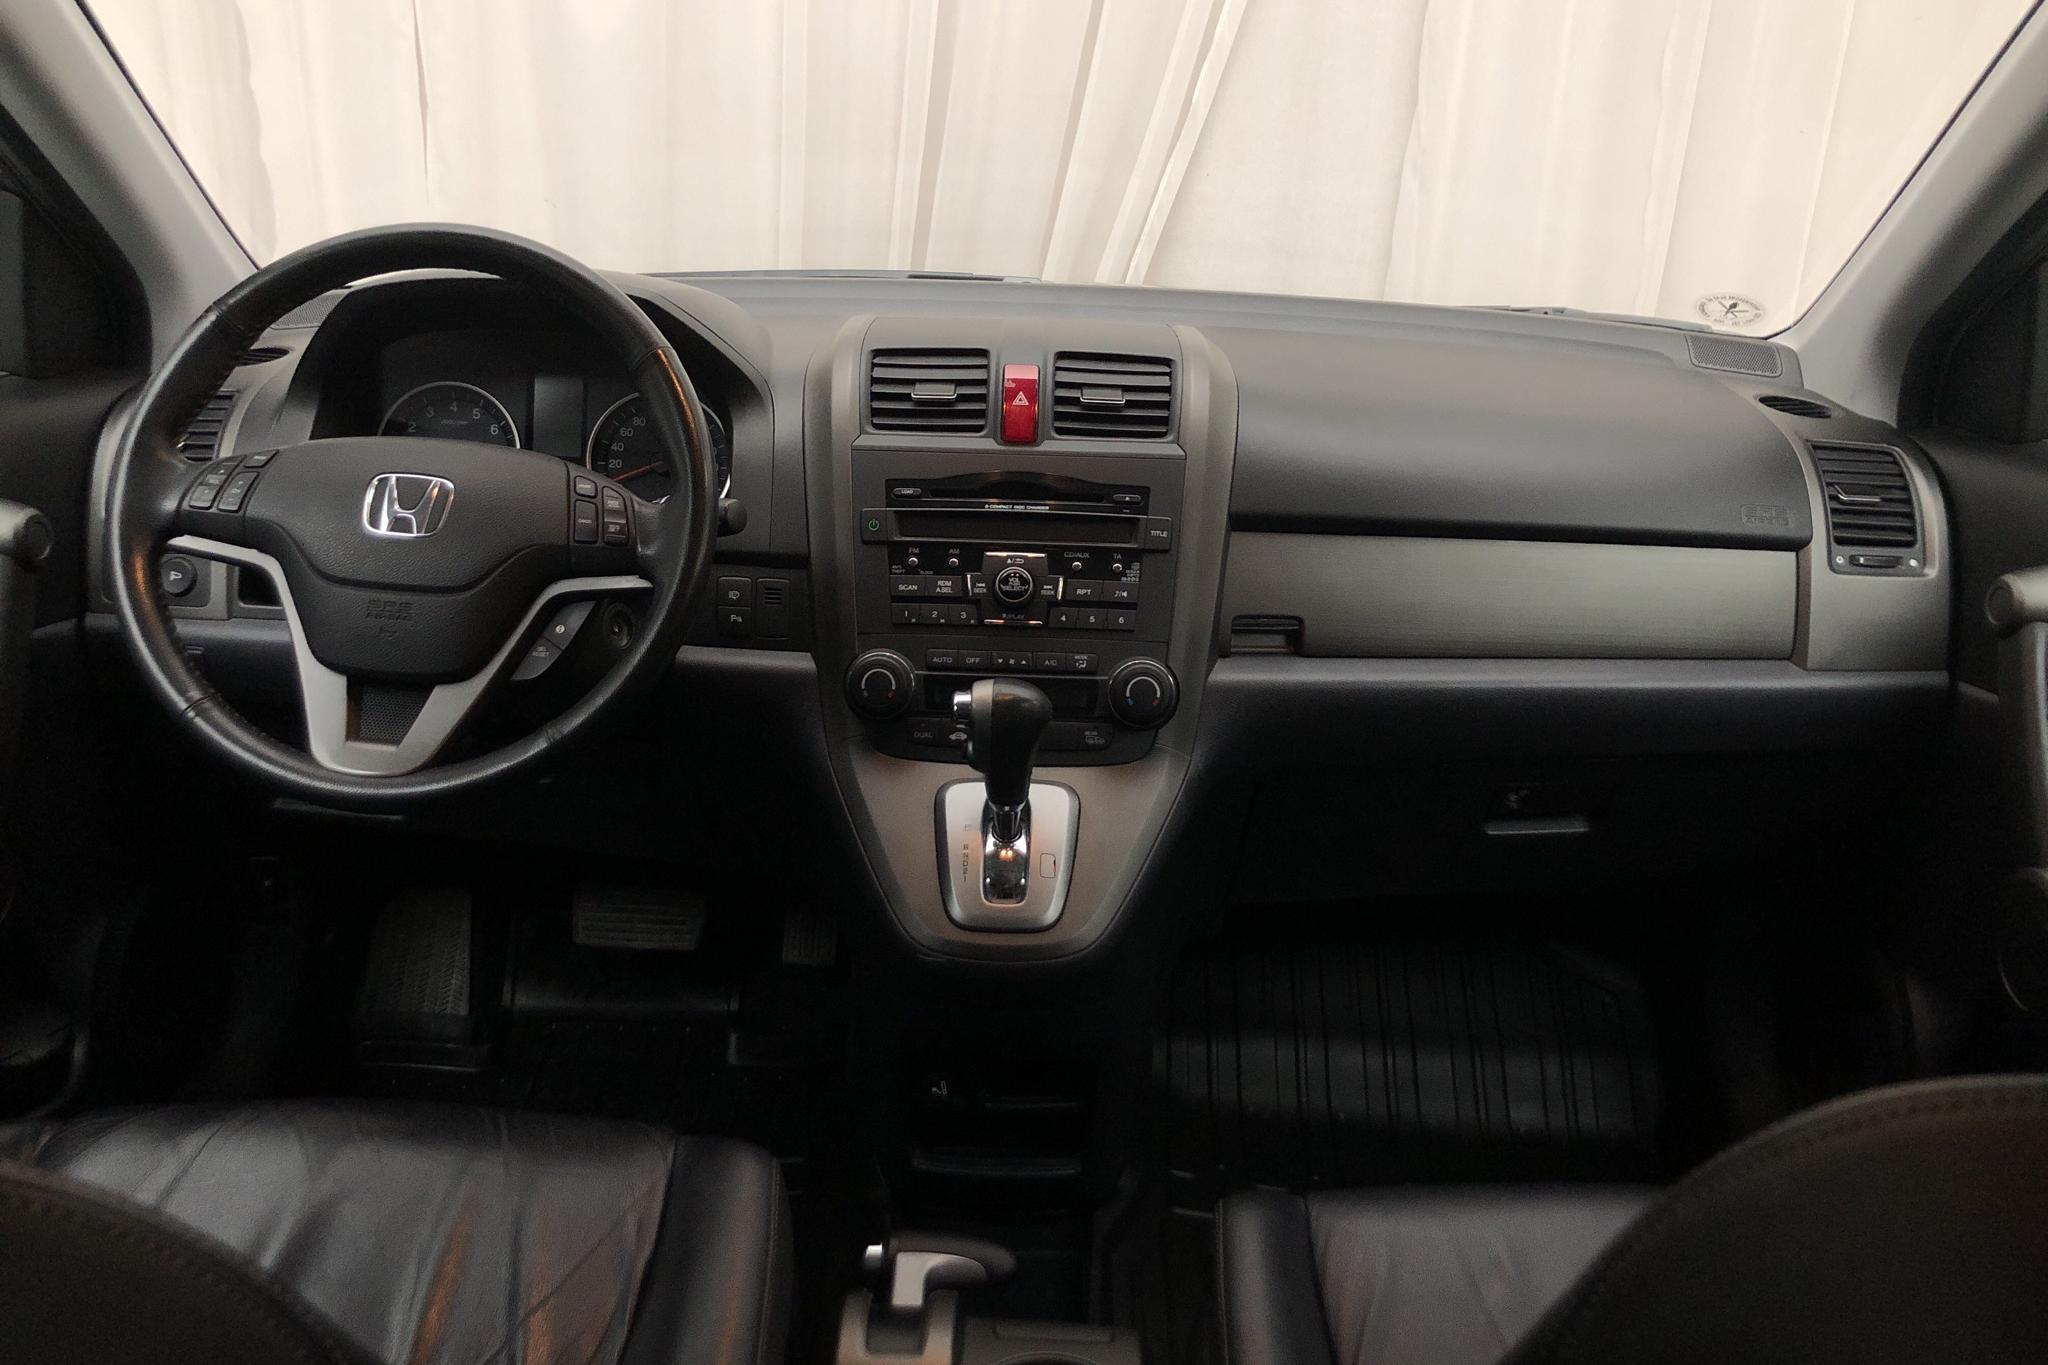 Honda CR-V 2.0 I-VTEC (150hk) - 120 290 km - Automatic - gray - 2012